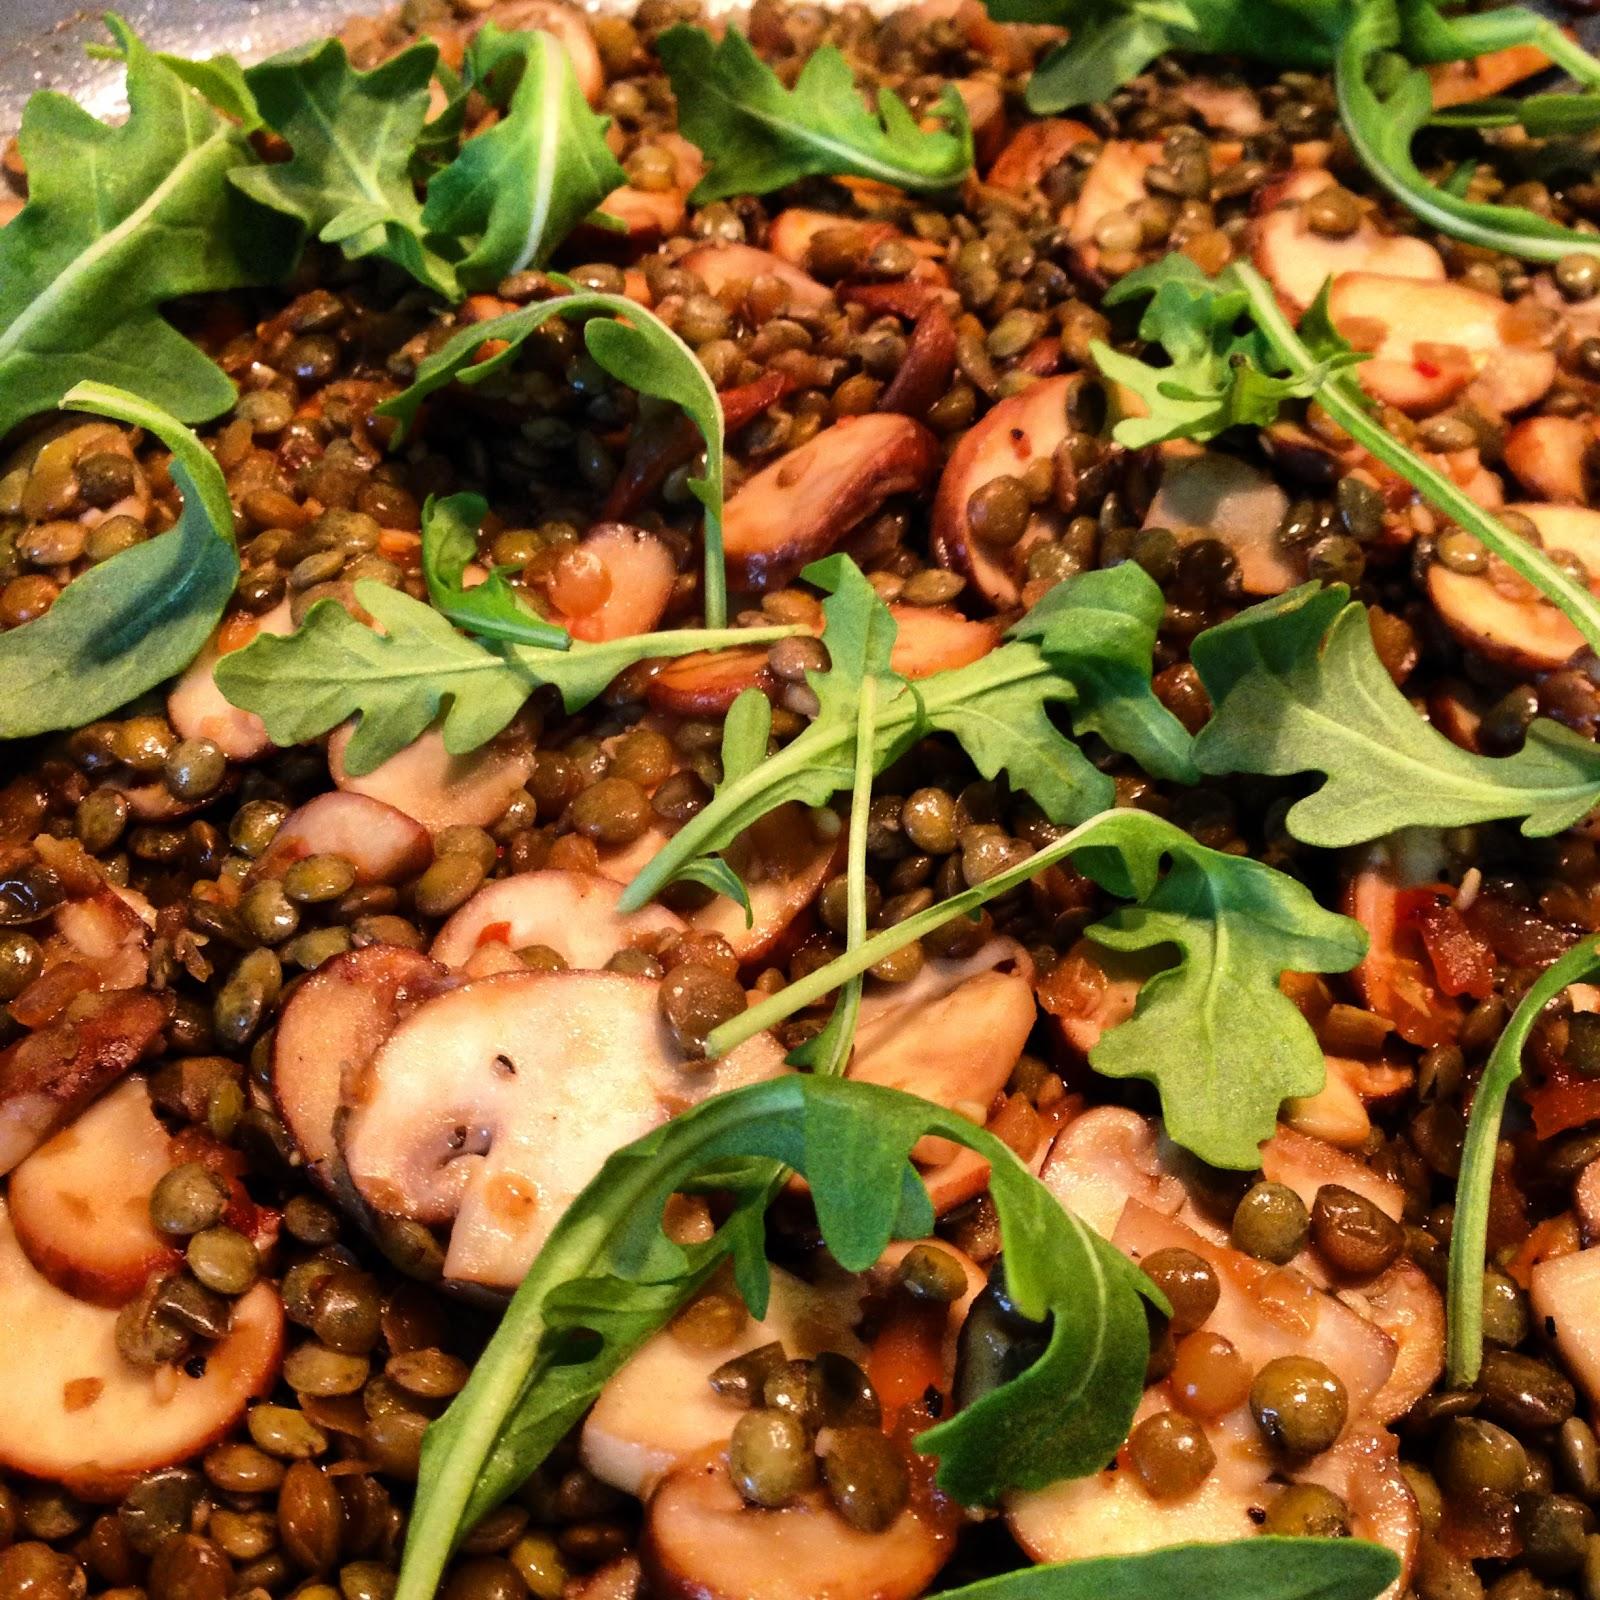 A Tasty Meal For My Vegetarian Followers…..Mushroom and Lentil Salad